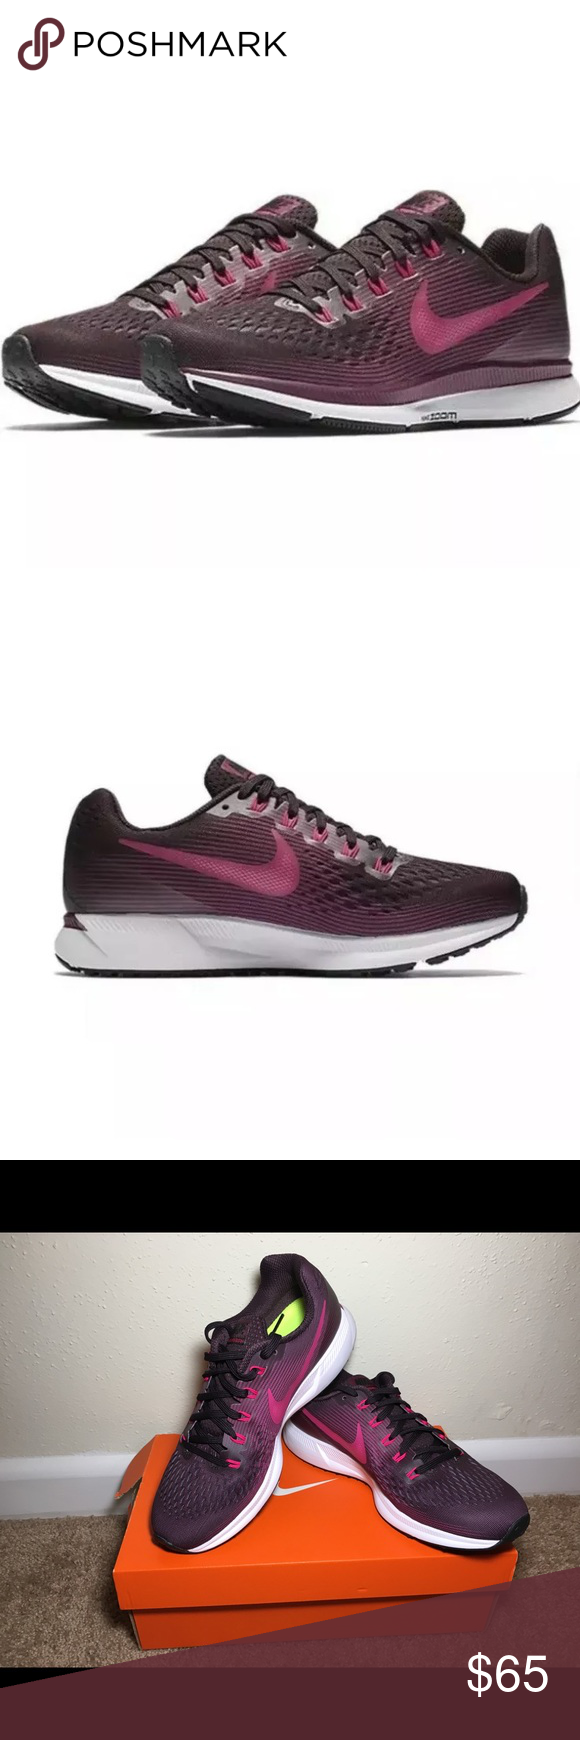 74a16f4fadde0 Women s Nike Air Zoom Pegasus 34 S9 Women s Nike Air Zoom Pegasus 34  Running Shoes 880560